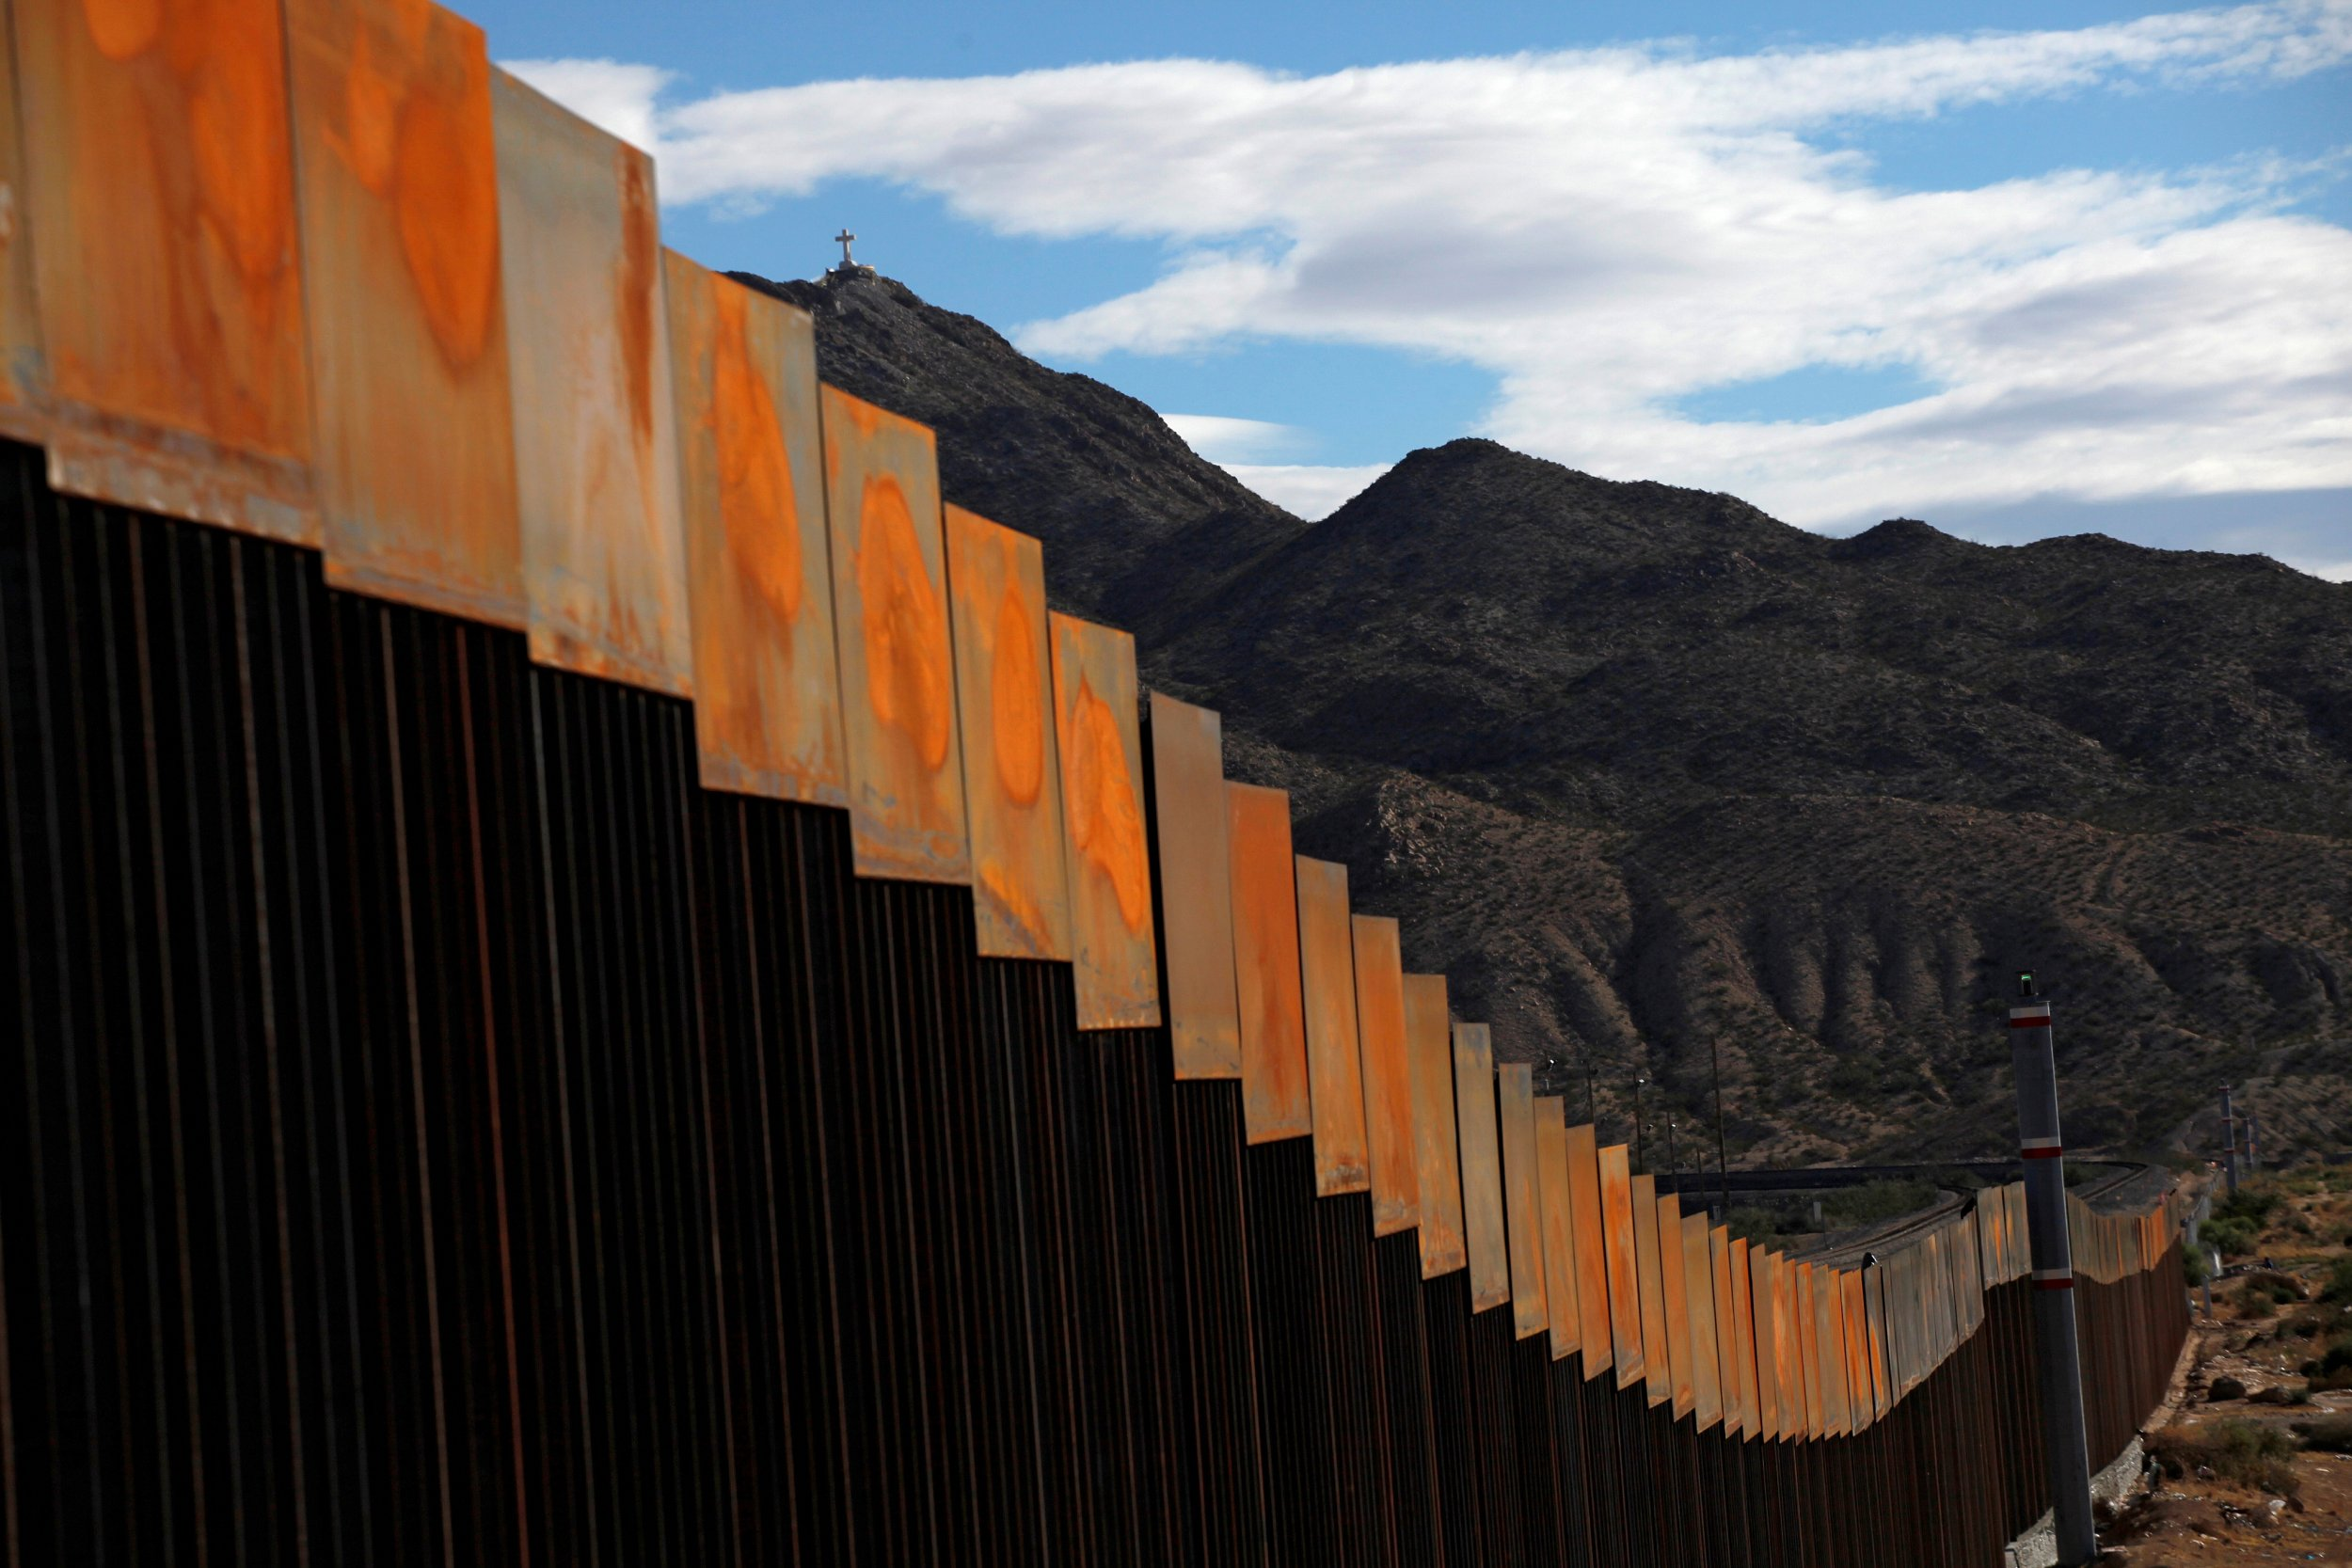 Donald Trump Mexico wall